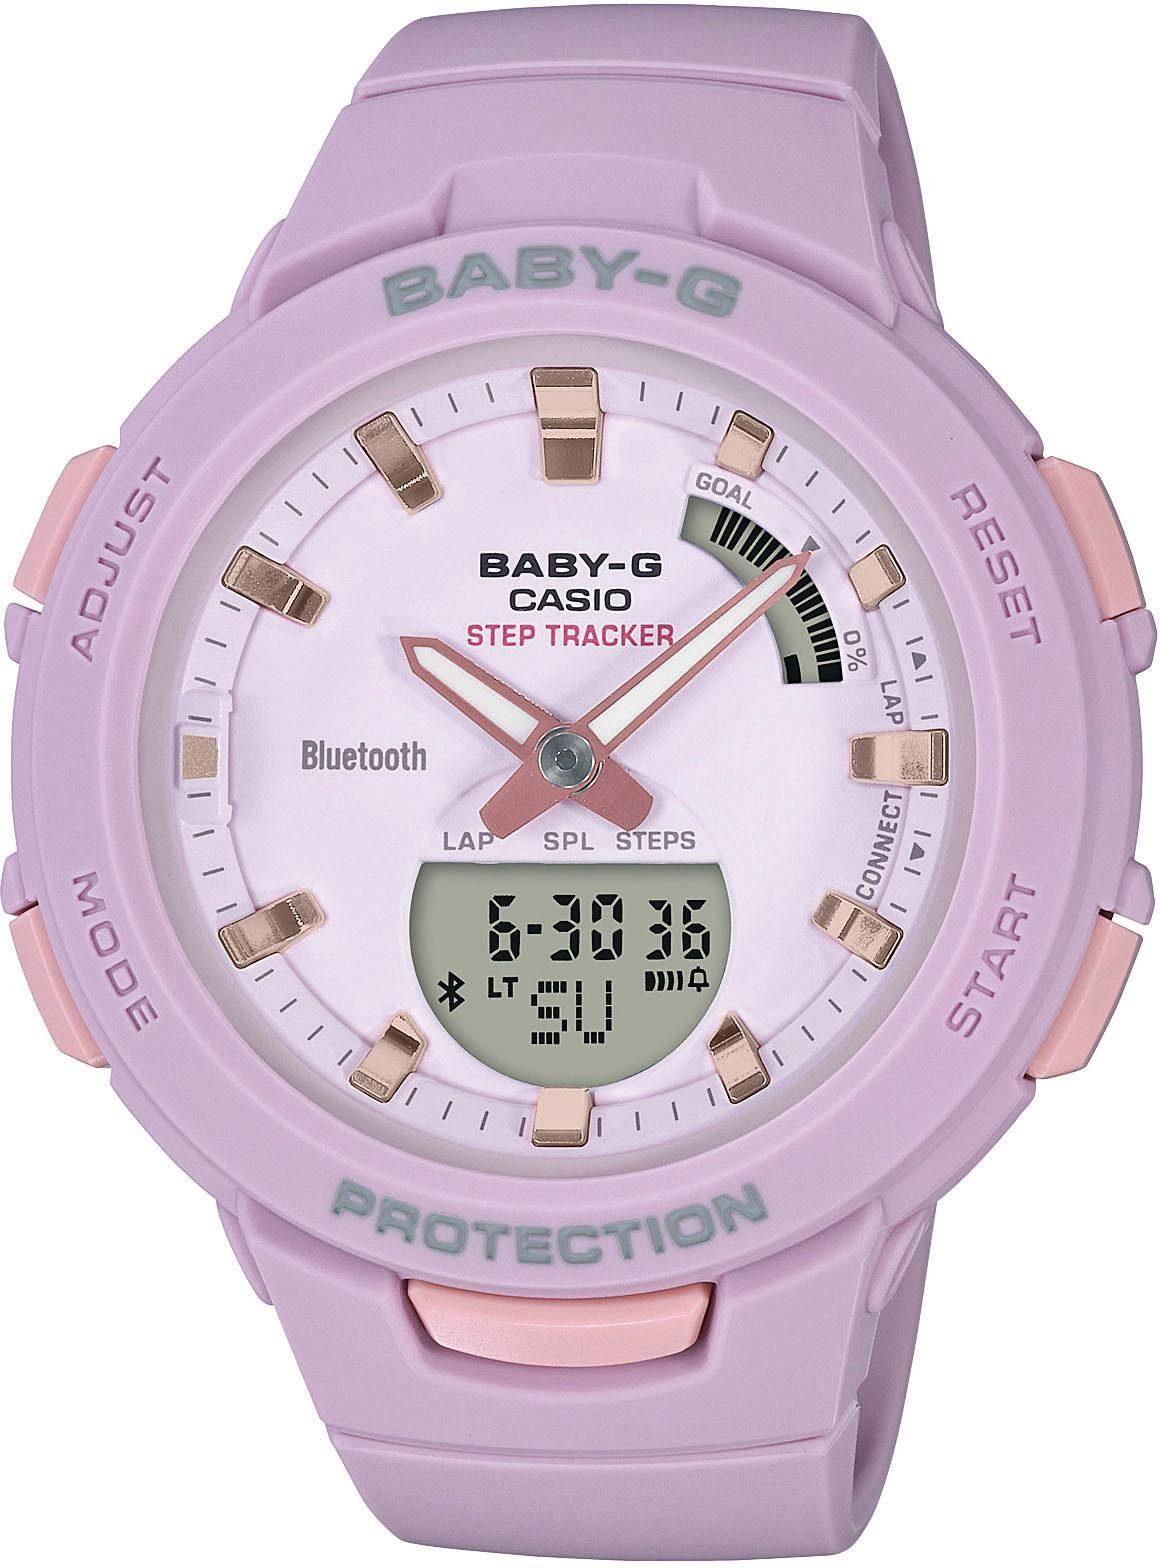 CASIO BABY-G Chronograph »BSA-B100-4A2ER«